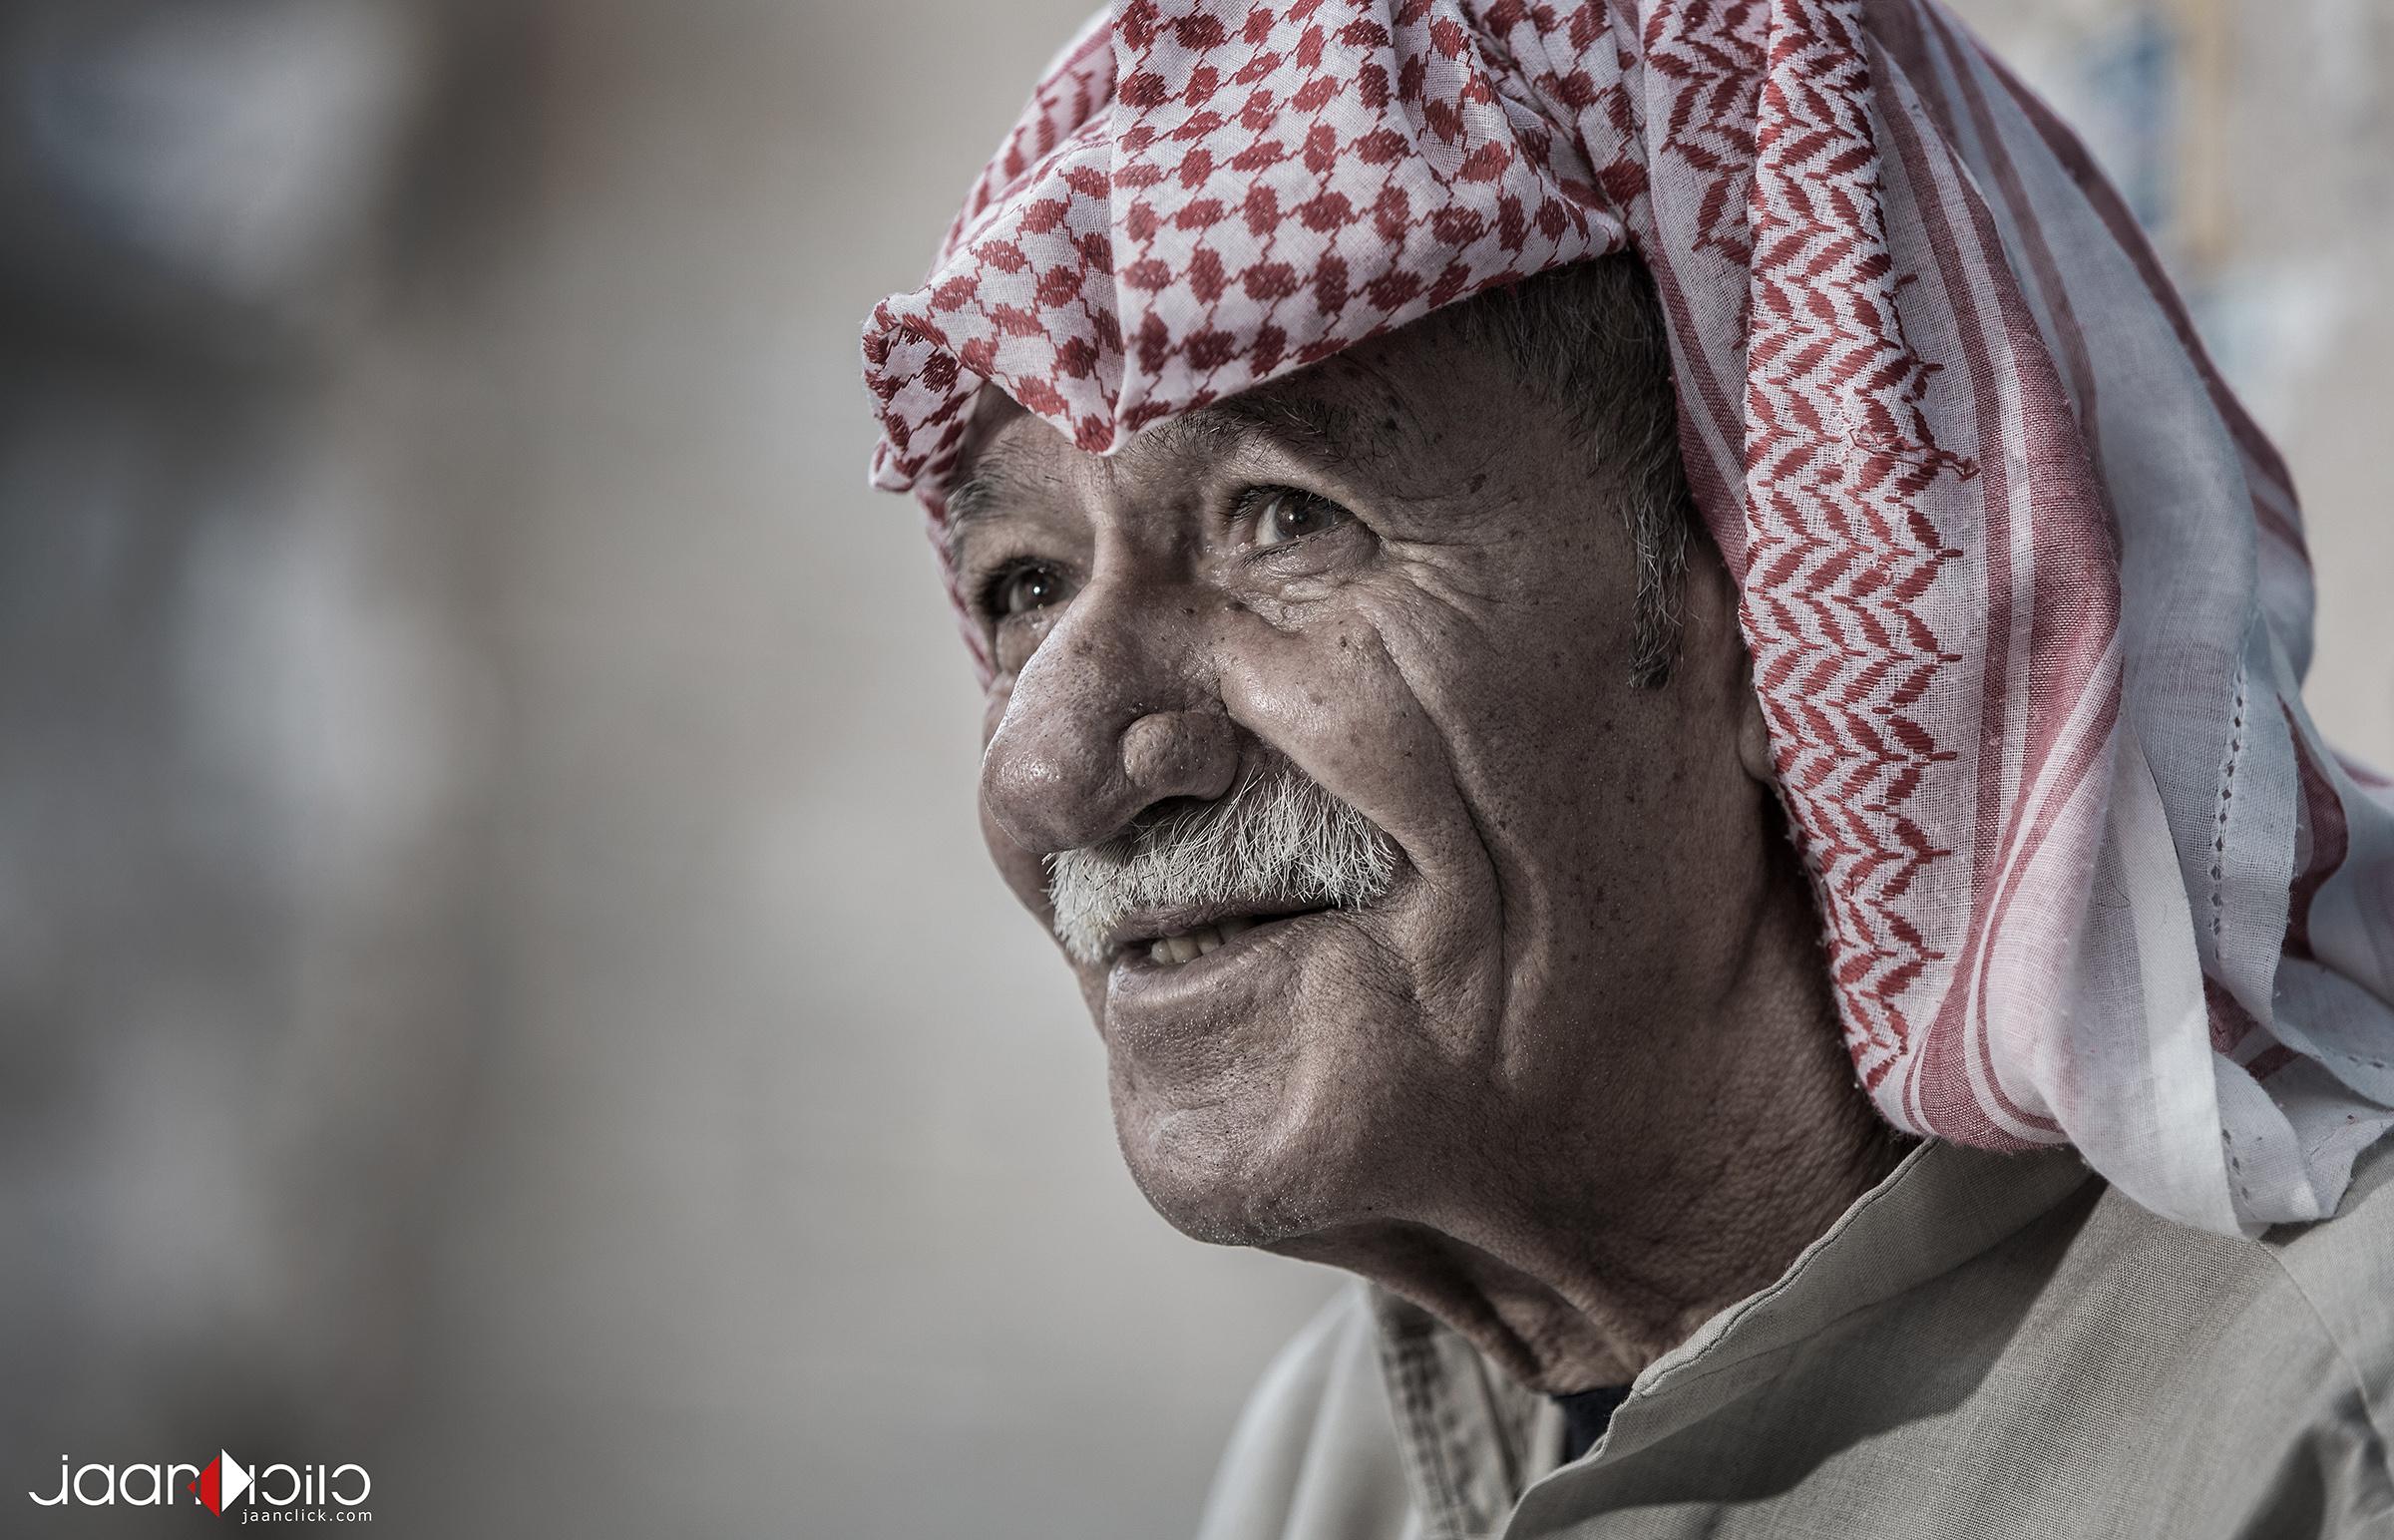 wear the wrinkles and smile.jpg